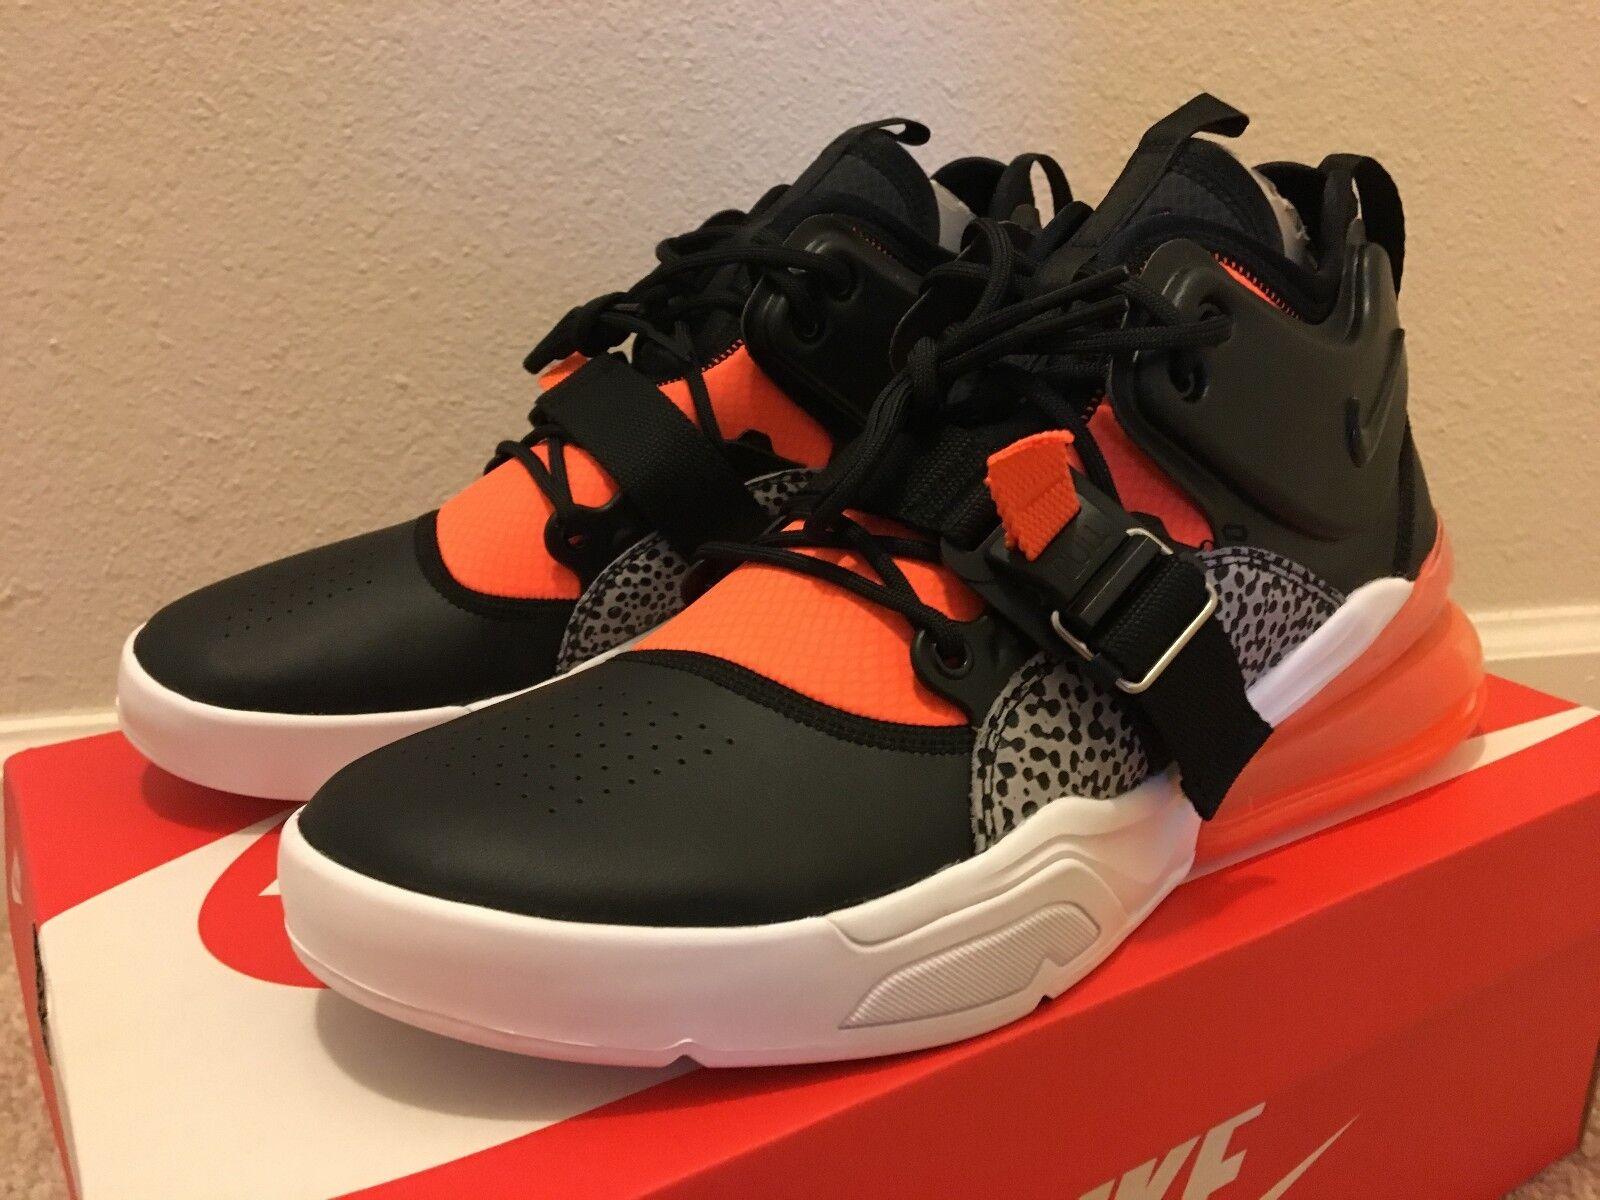 Nike Air Force 270 Nero Orange Uomo Basketball Shoes US Size 10 RARE